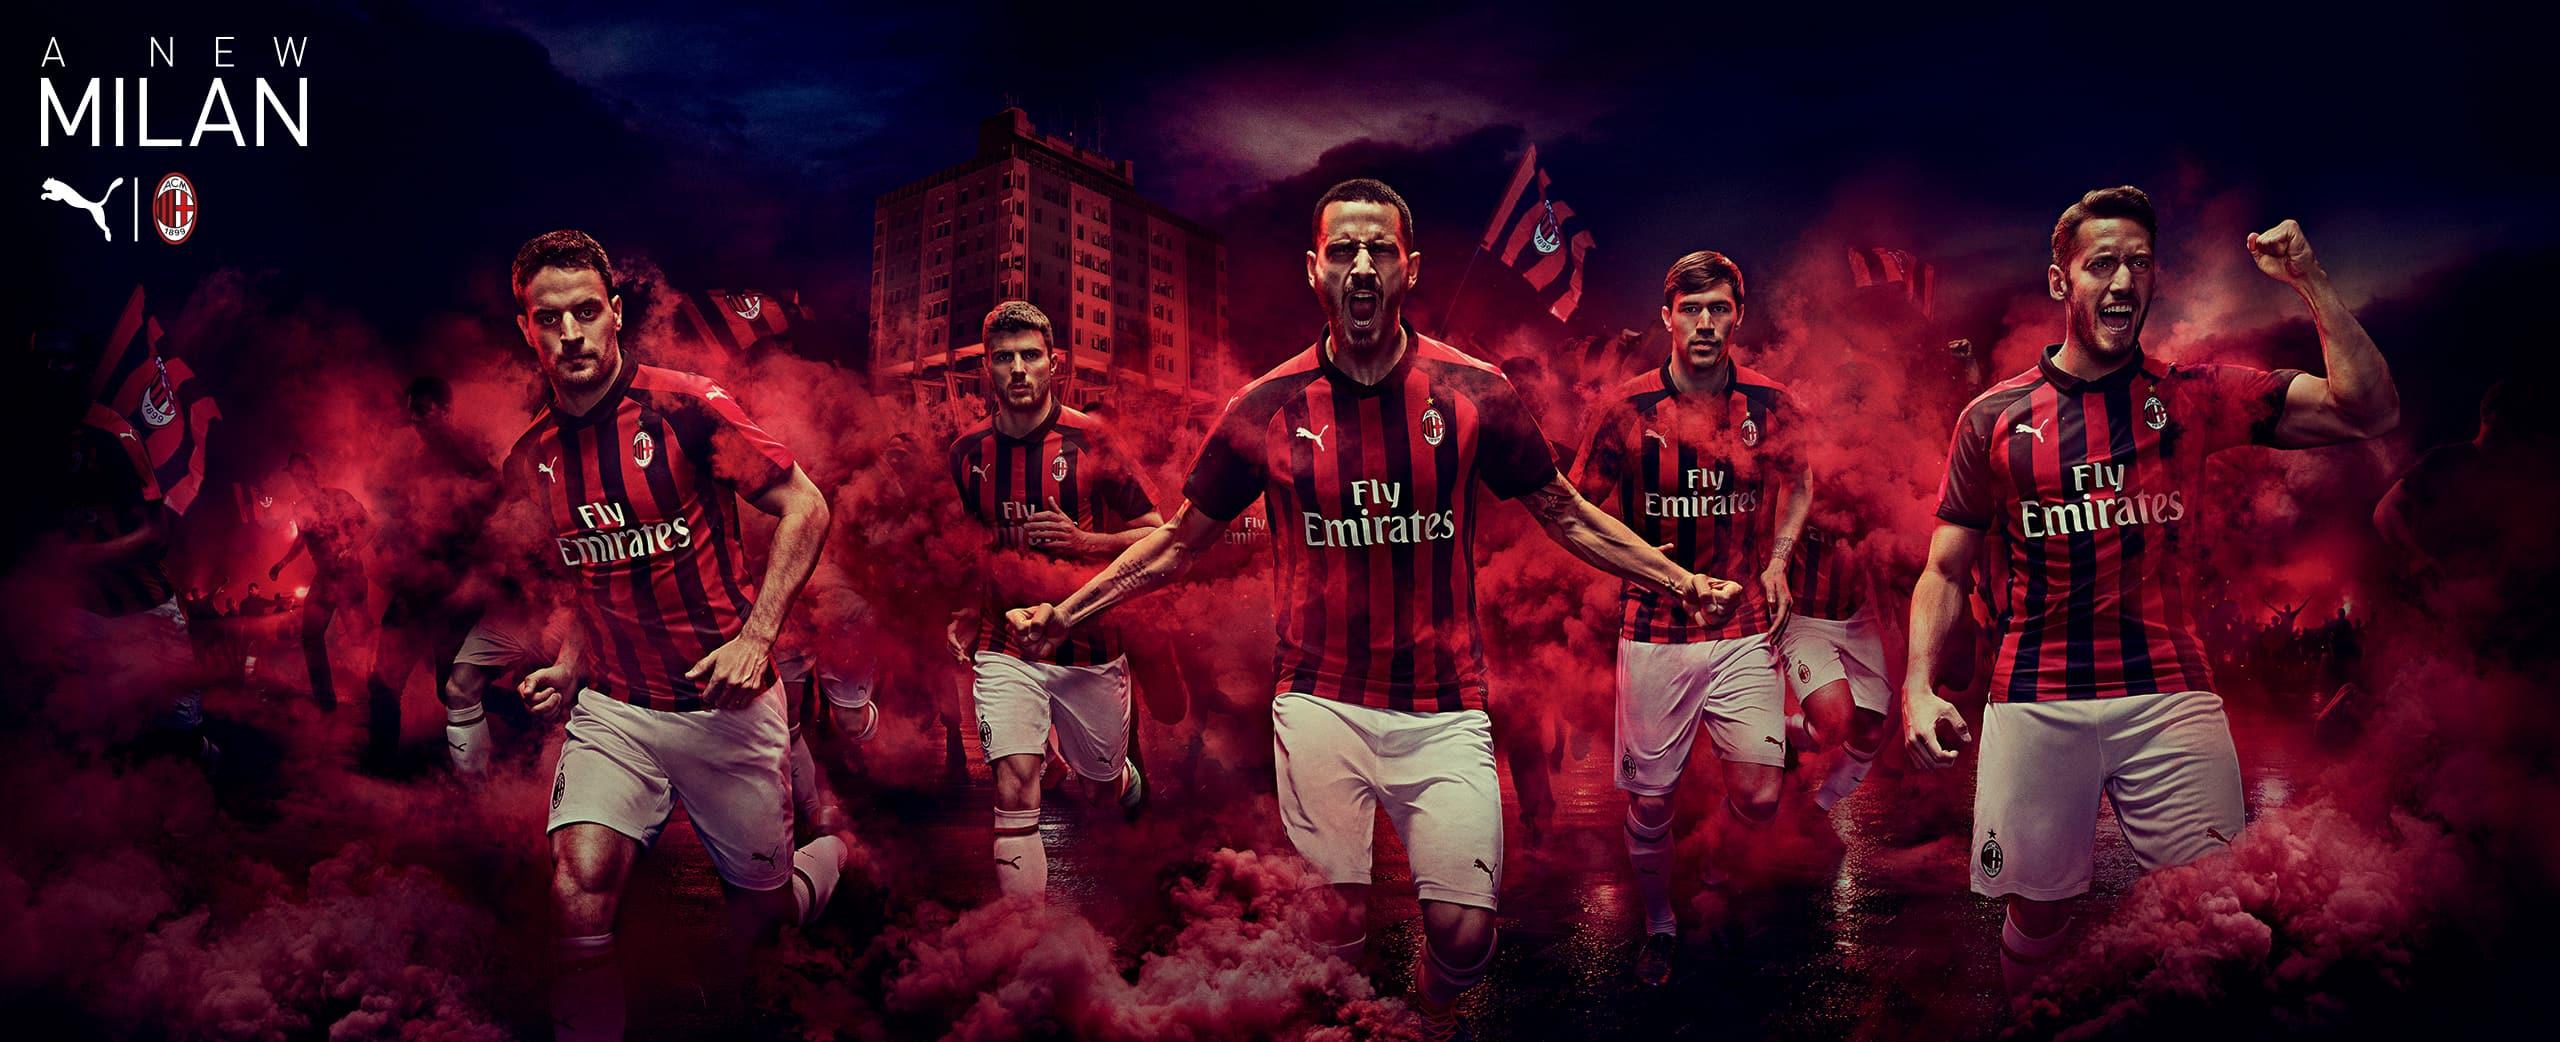 22fd6ddcb Puma reveal AC Milan's 2018/19 home kit and merchandise